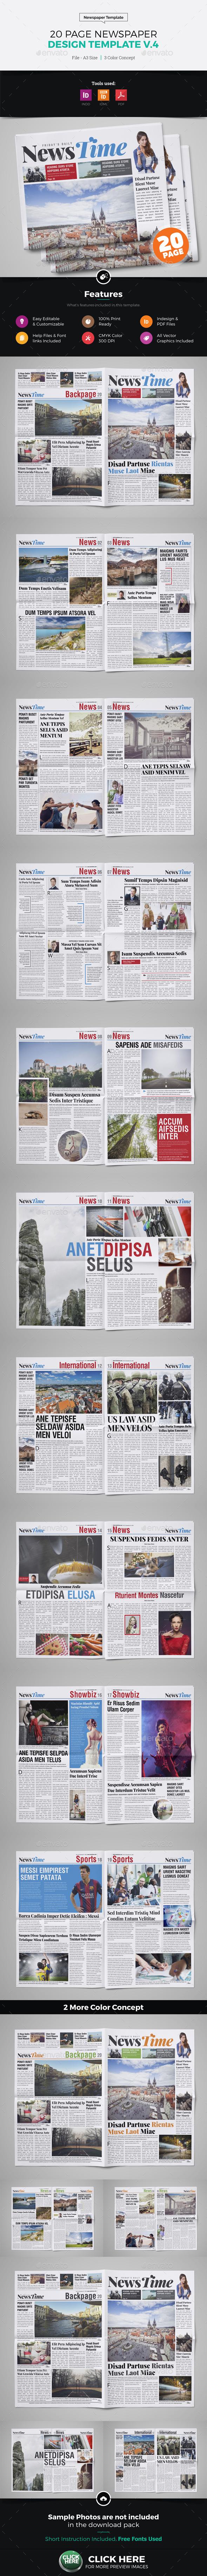 20 Page Newspaper Design v4 - Newsletters Print Templates